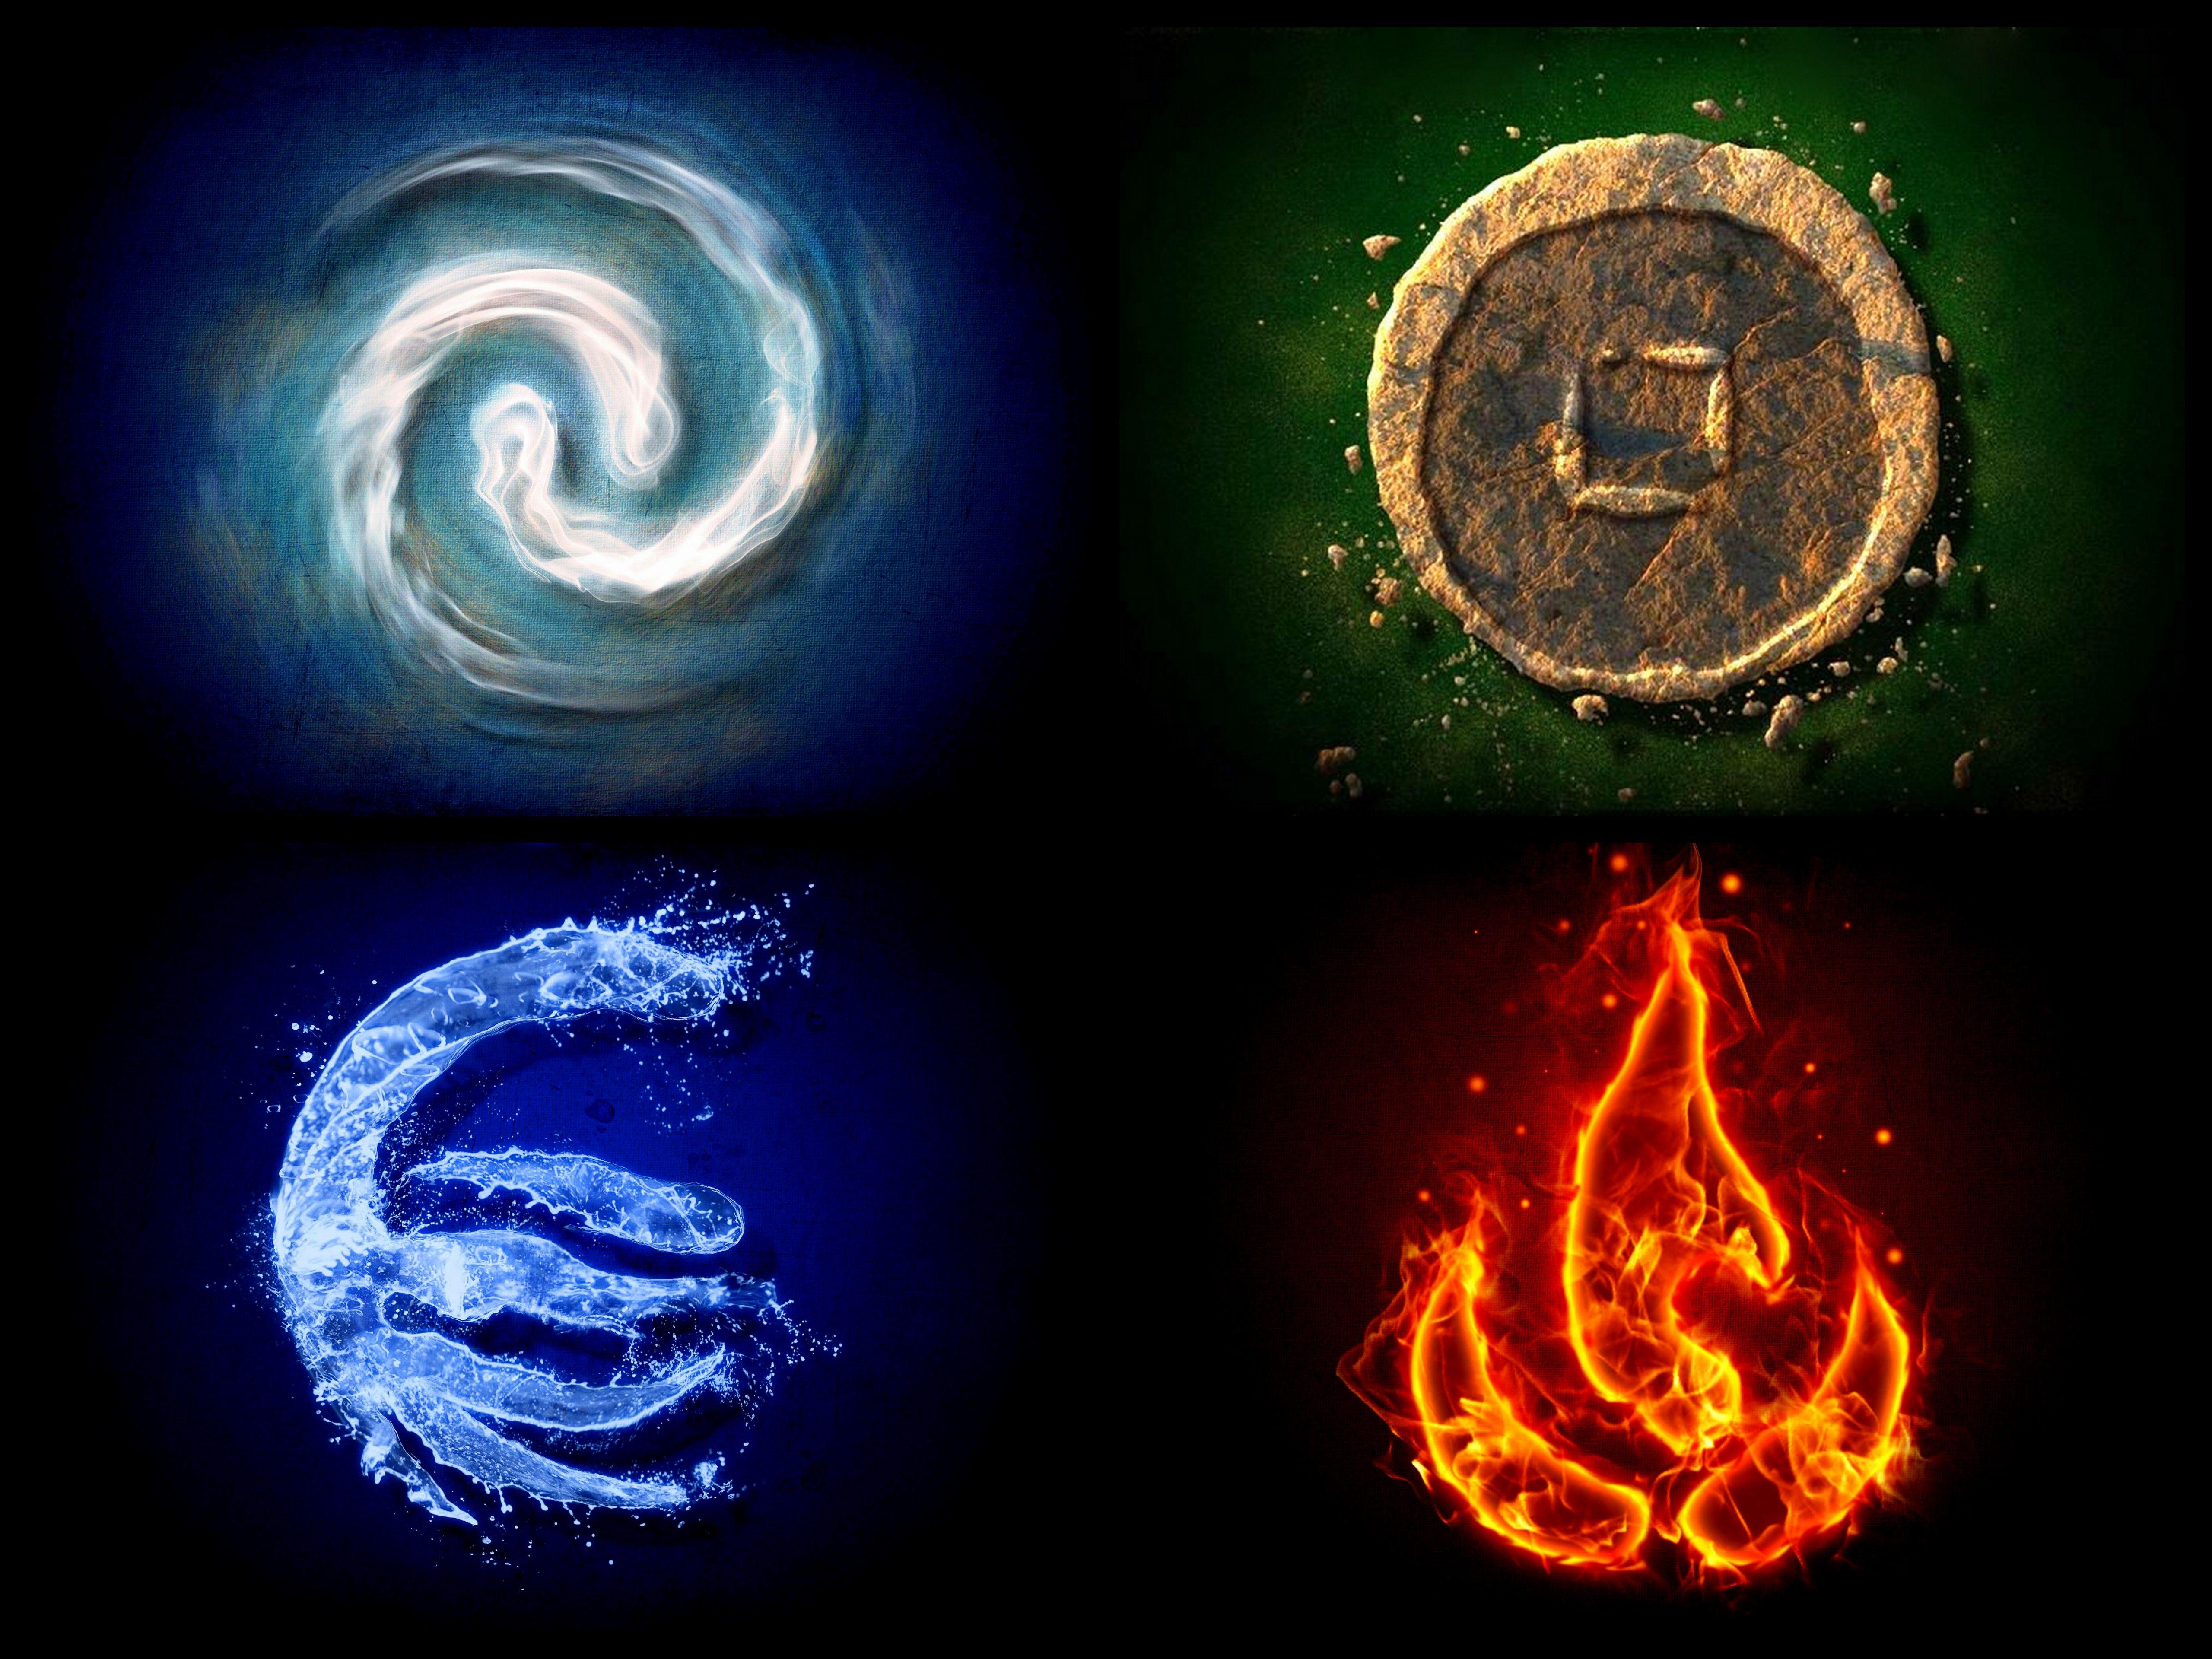 4 Elementos Pesquisa Google Elementos Simbolos Elementos Los 4 Elementos